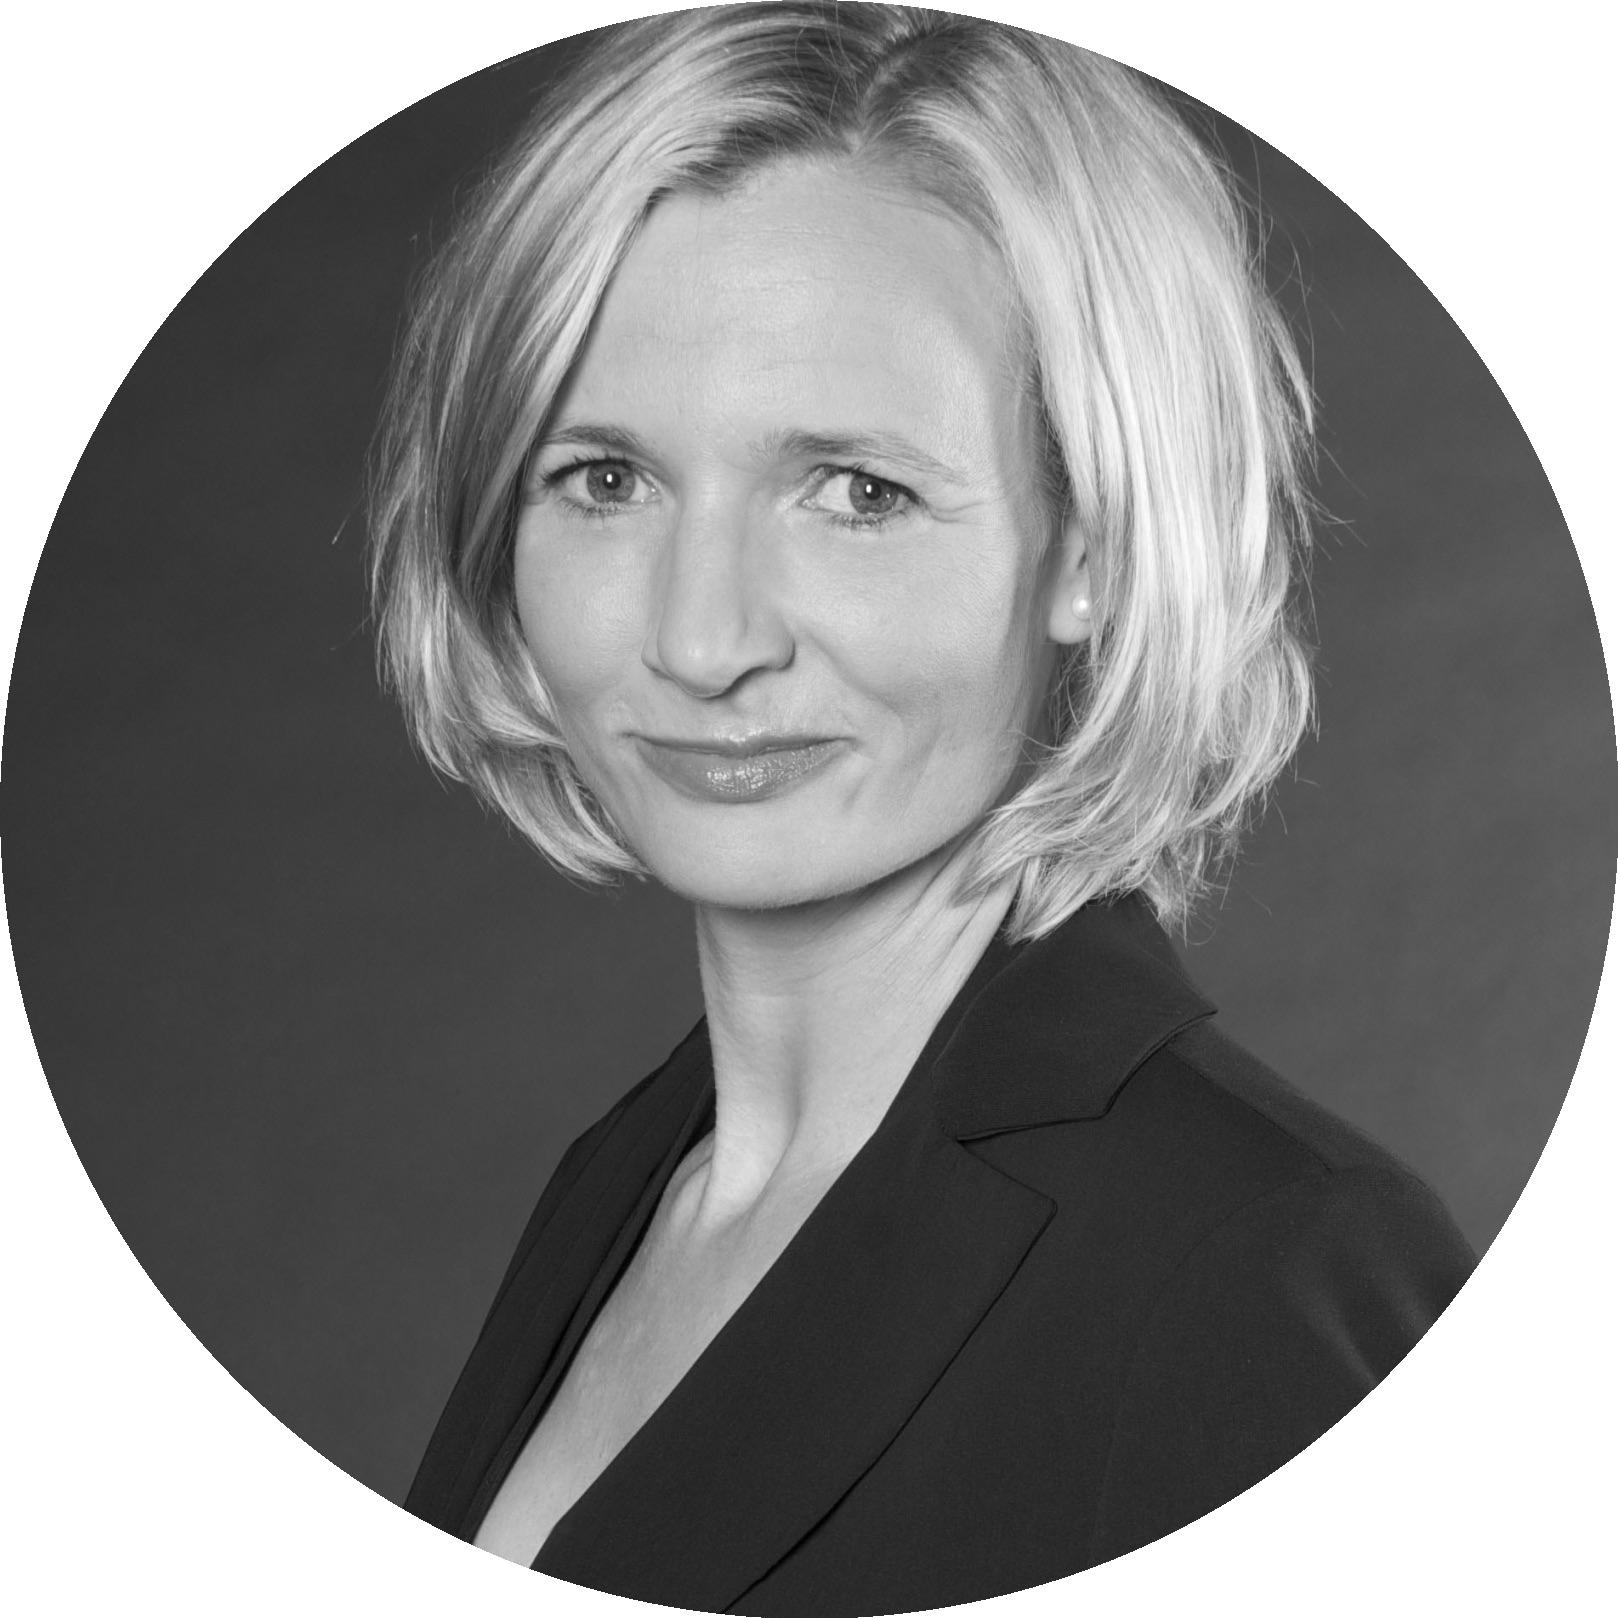 Yana Gebhardt